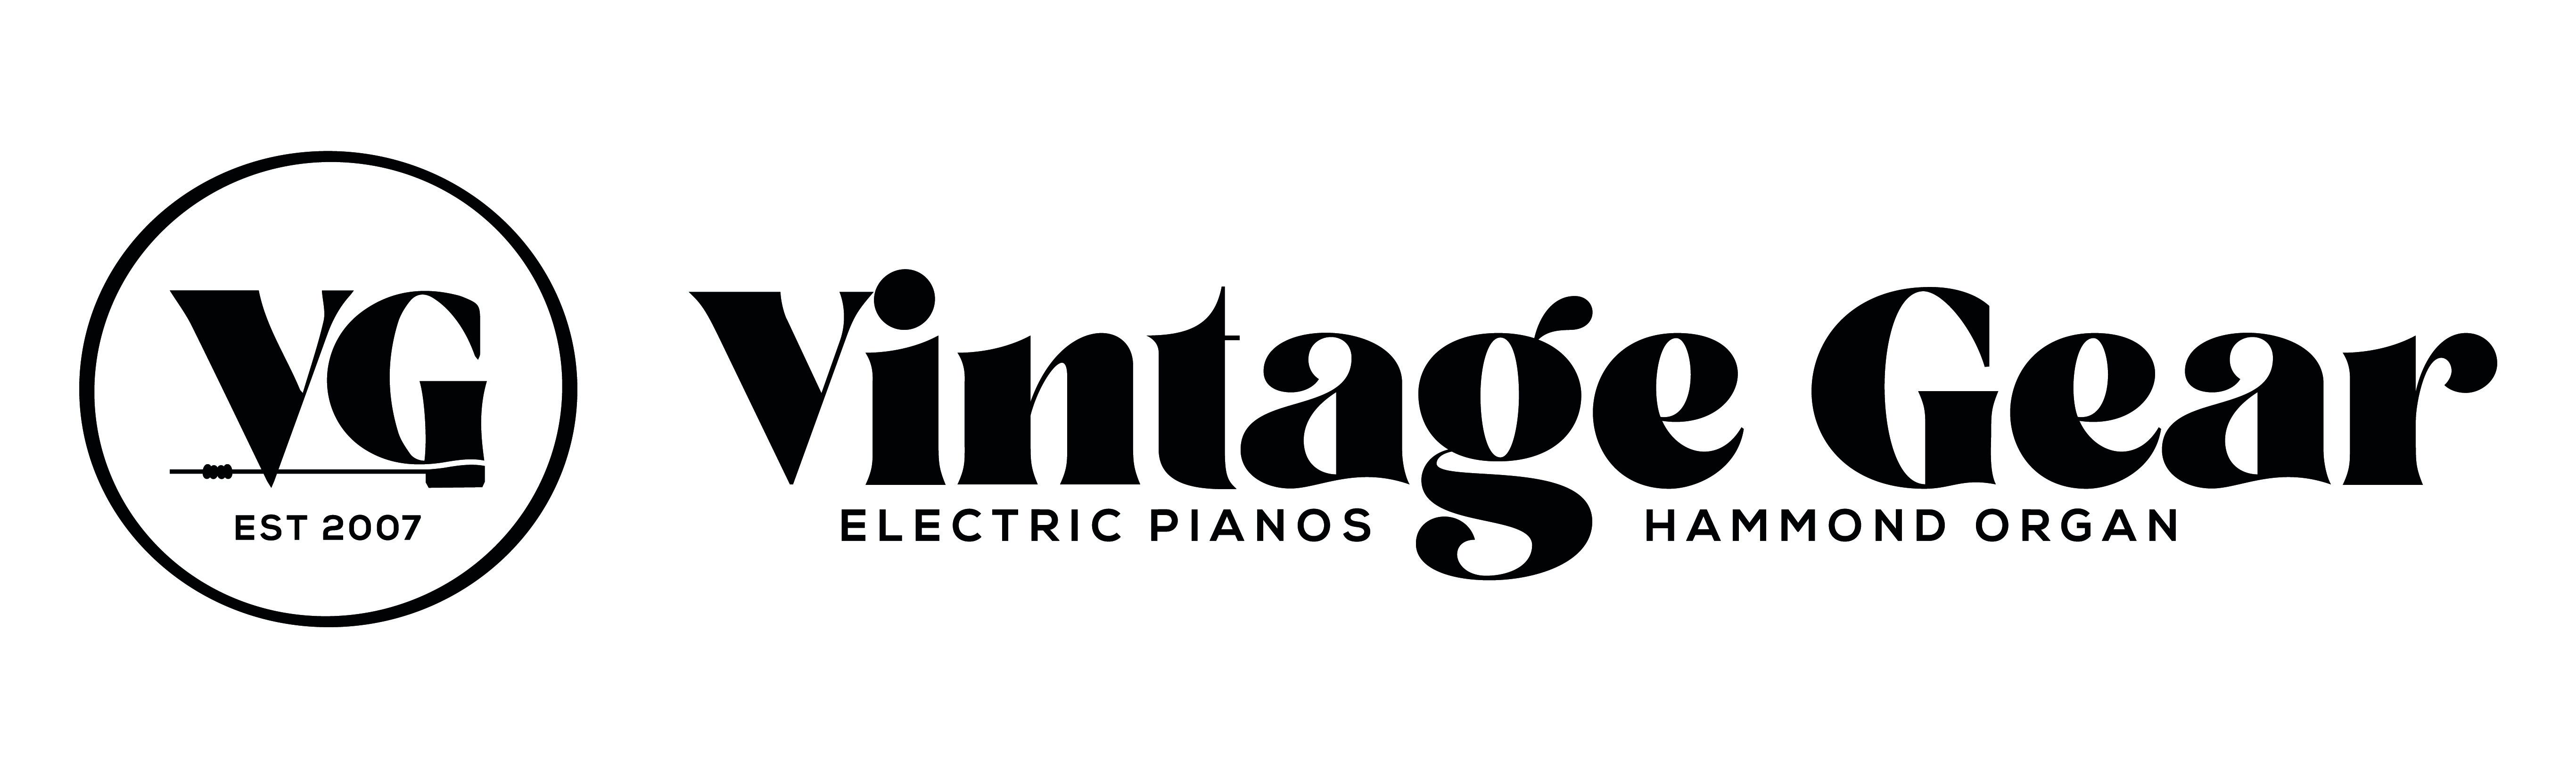 Vintage Gear - Echo Tomasz Radecki